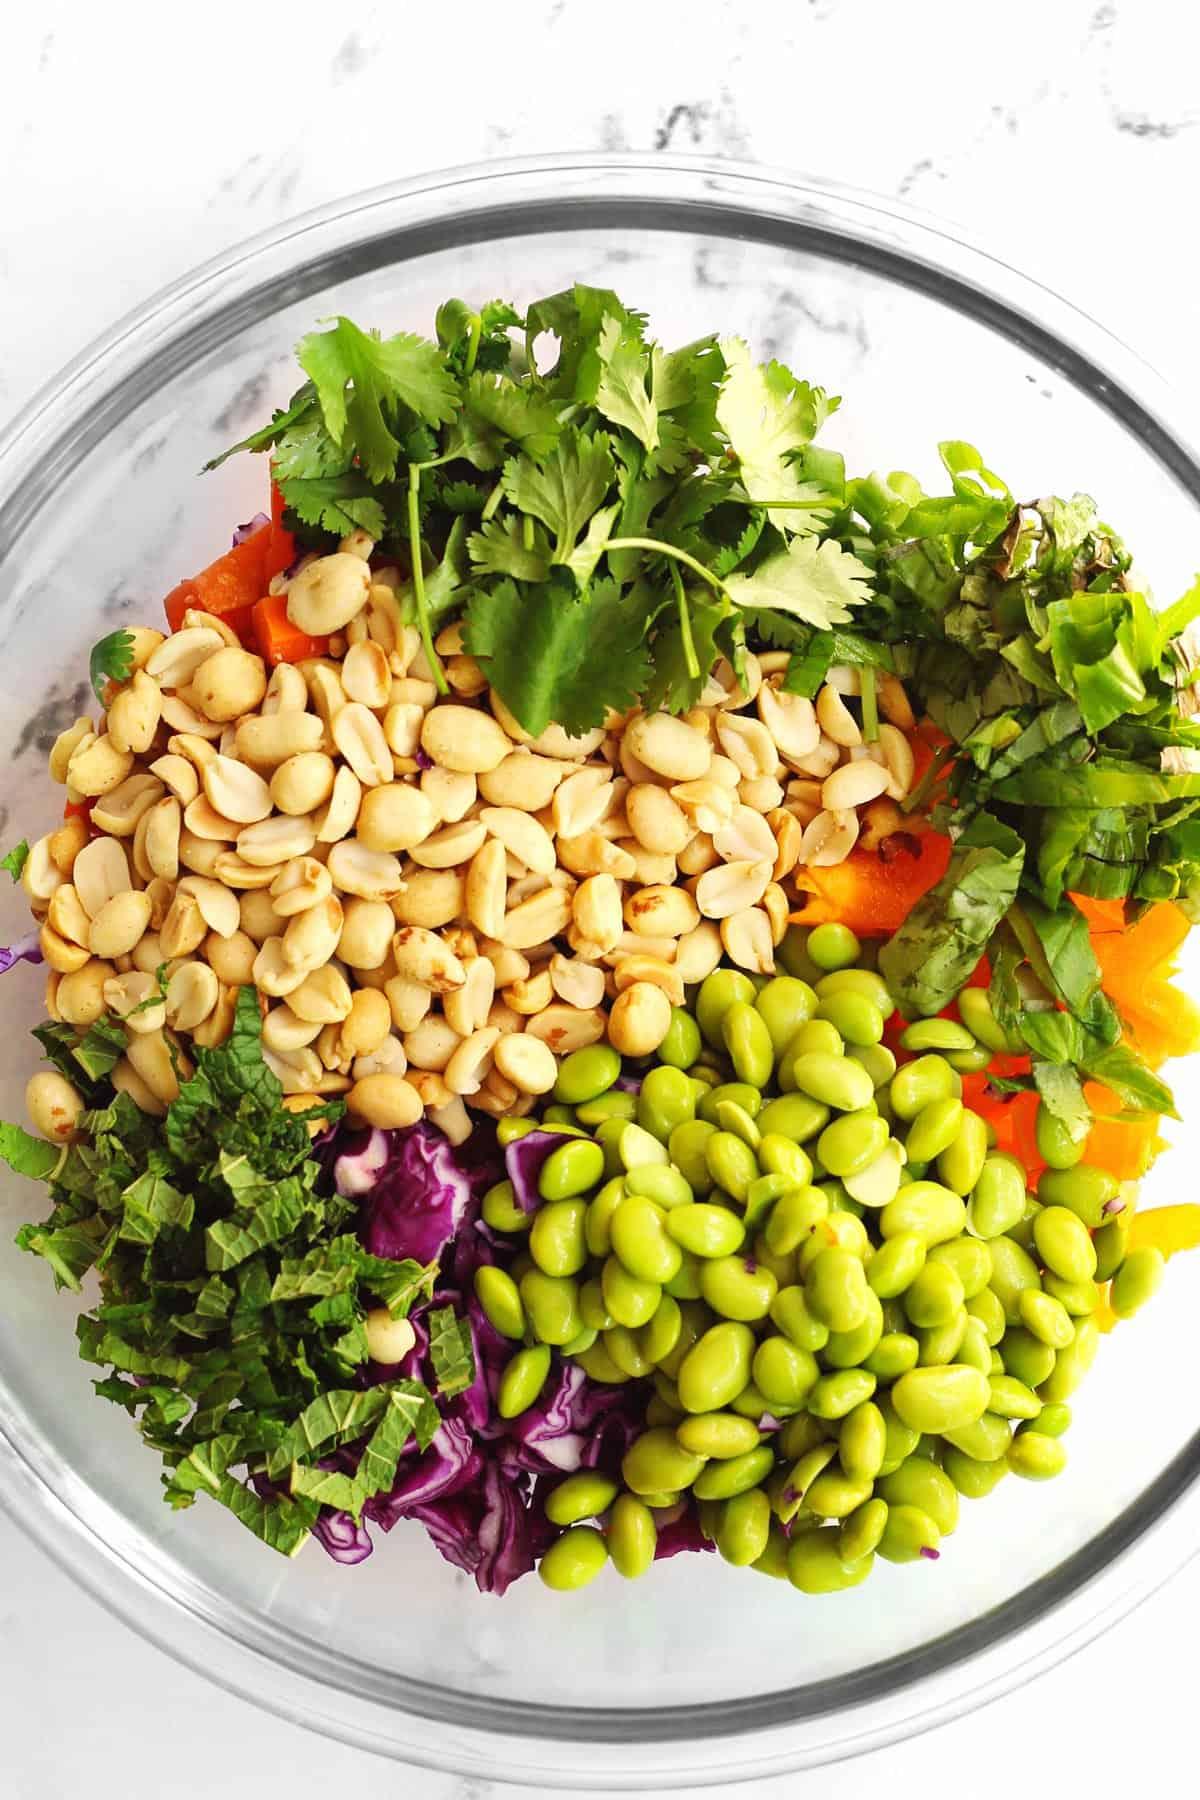 Thai peanut salad in a glass bowl